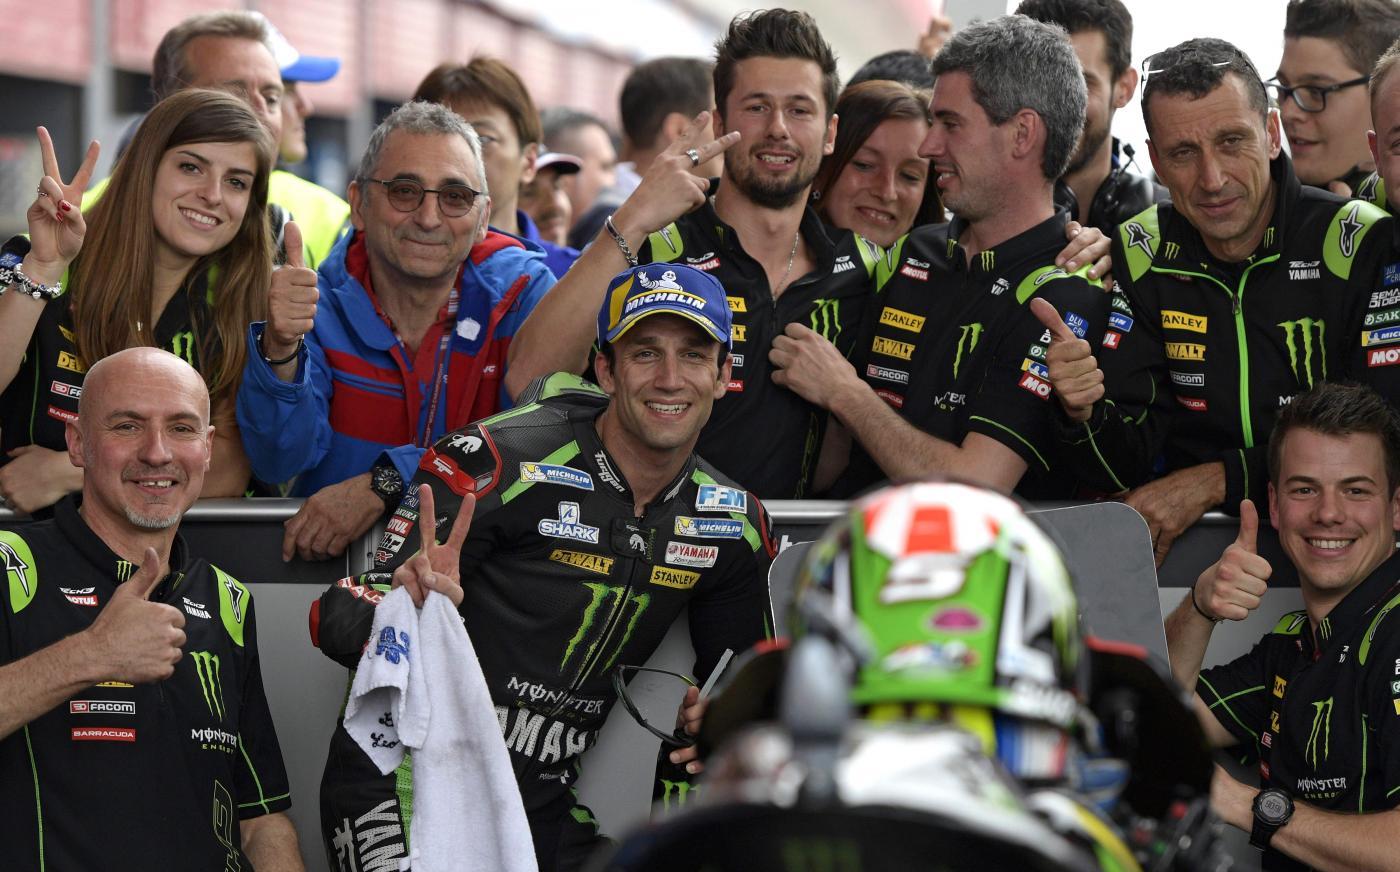 MotoGP: Zarco ha scelto, niente Honda. Sarà KTM per due anni